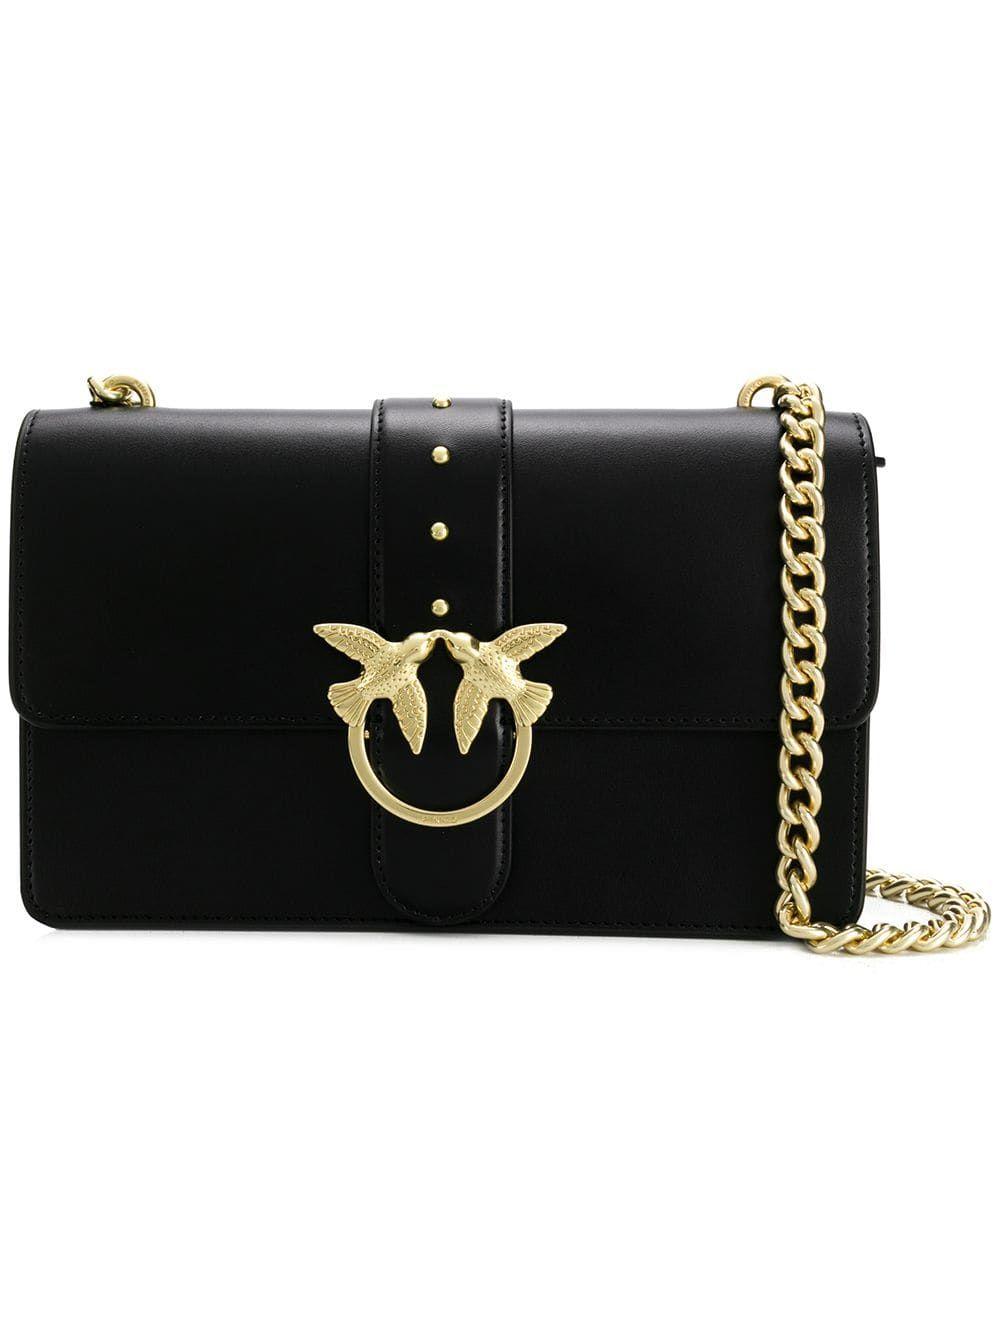 d394285b36a Pinko Simply crossbody bag - Black in 2019   Products   Crossbody ...